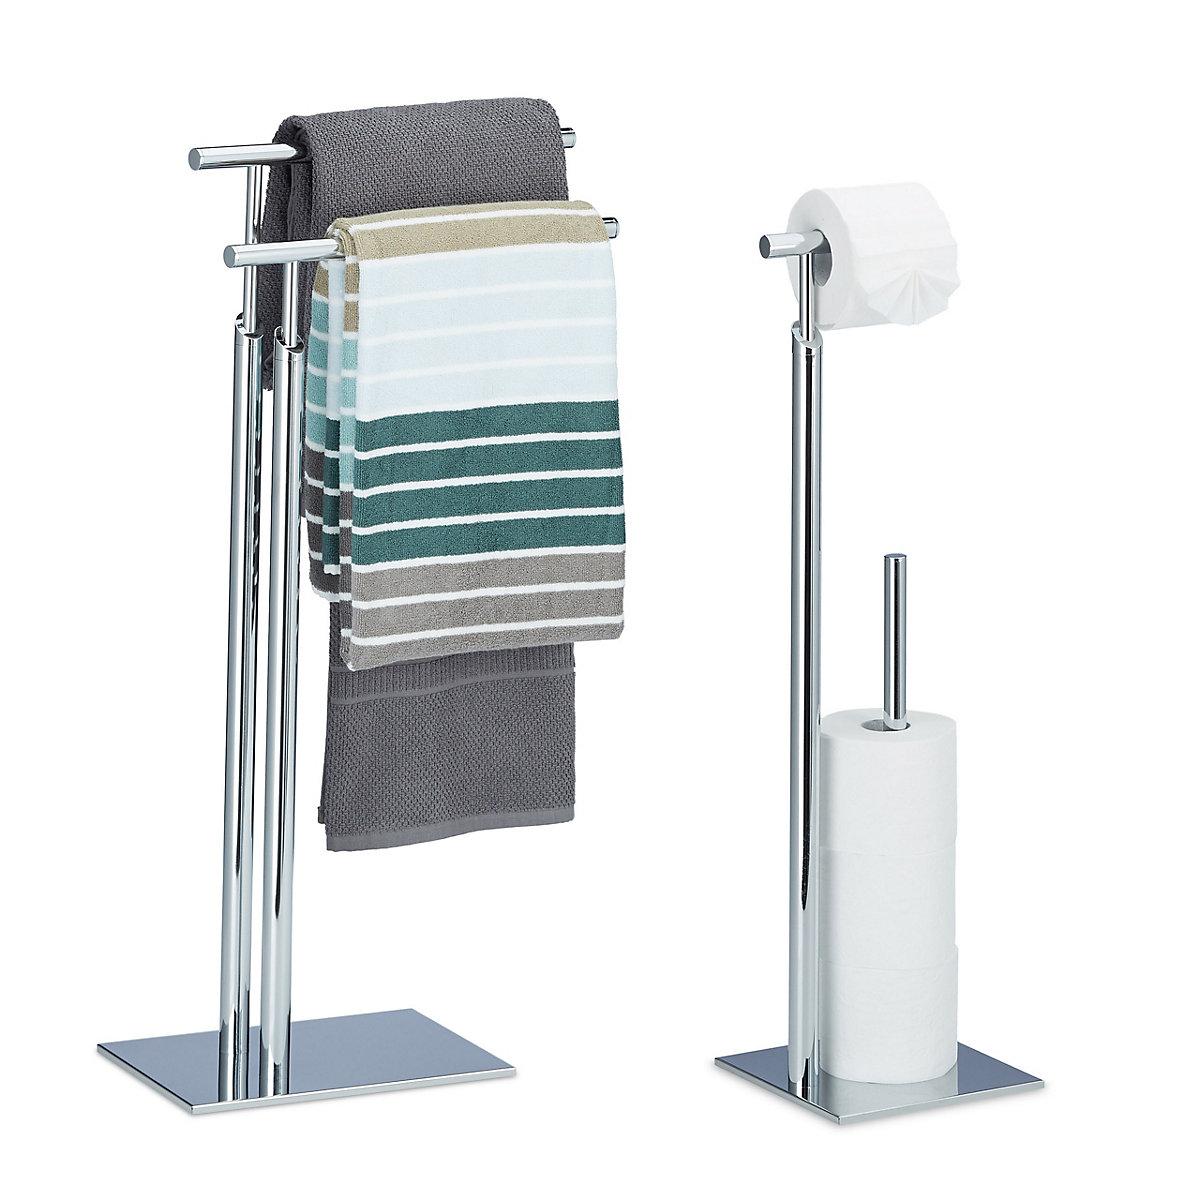 2 tlg Bad Set PAGNONI WC Garnitur Handtuchhalter